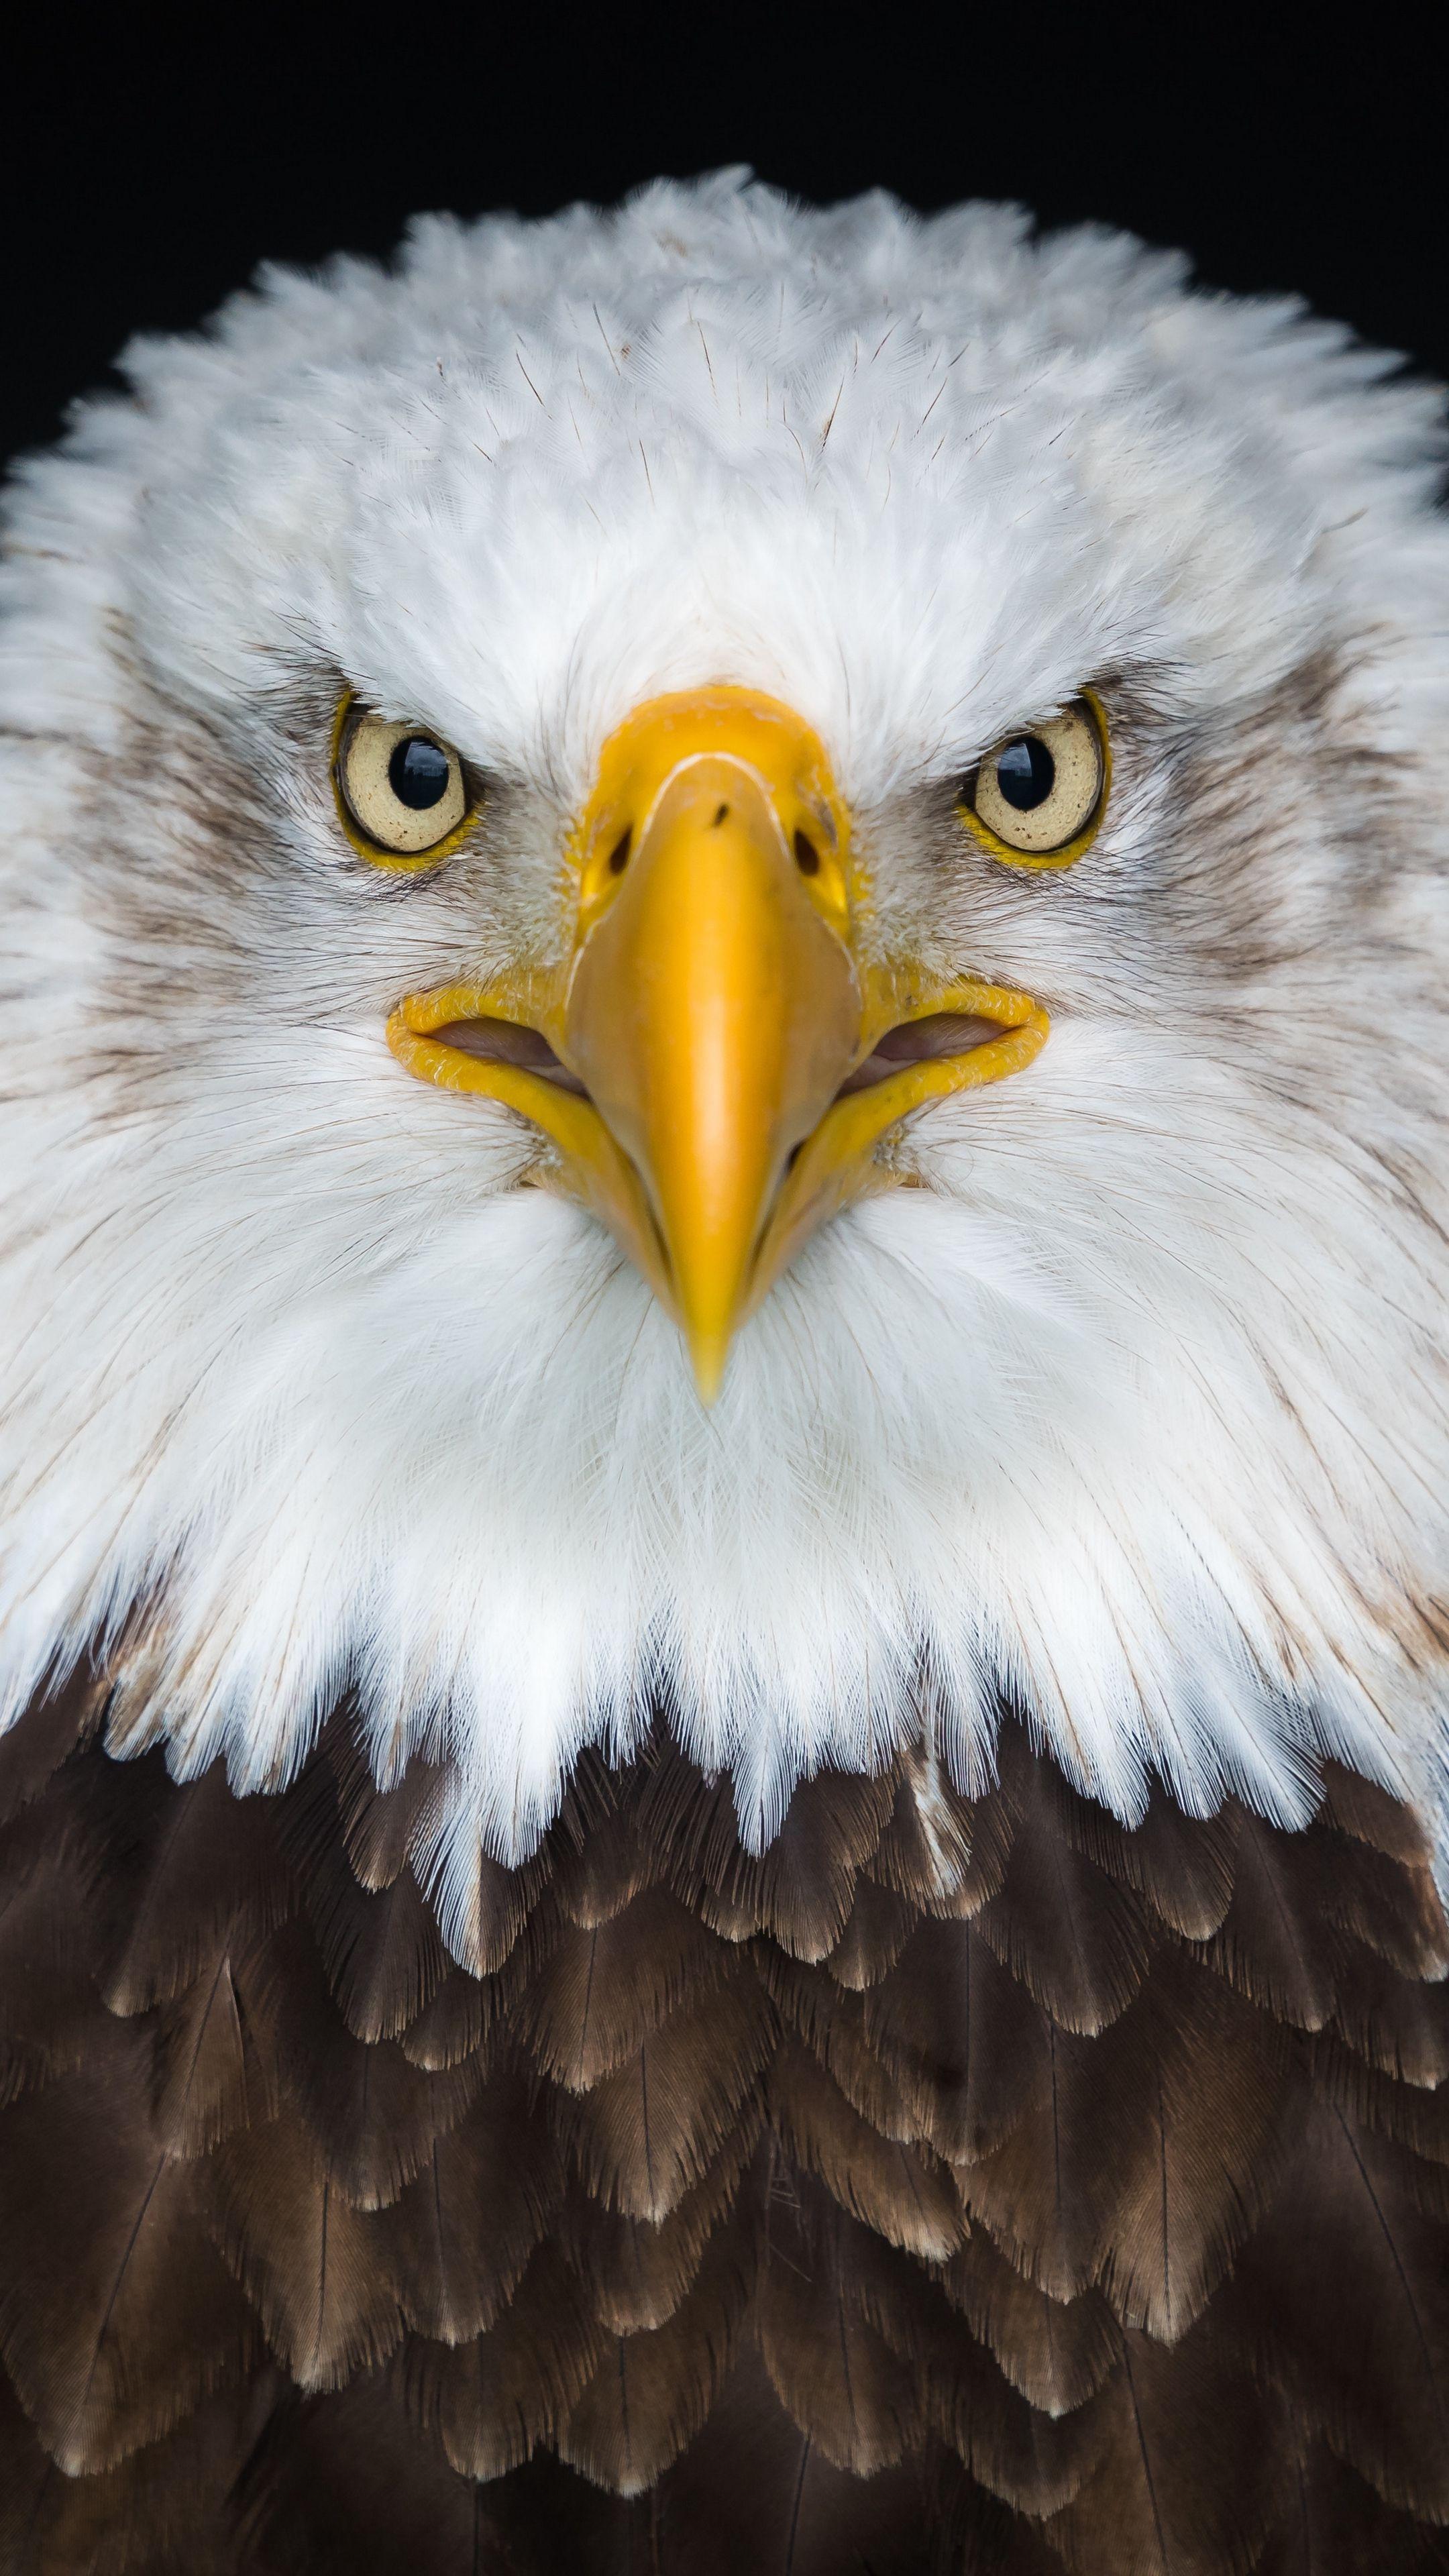 Animals baldeagle eagle bird wallpapers hd 4k